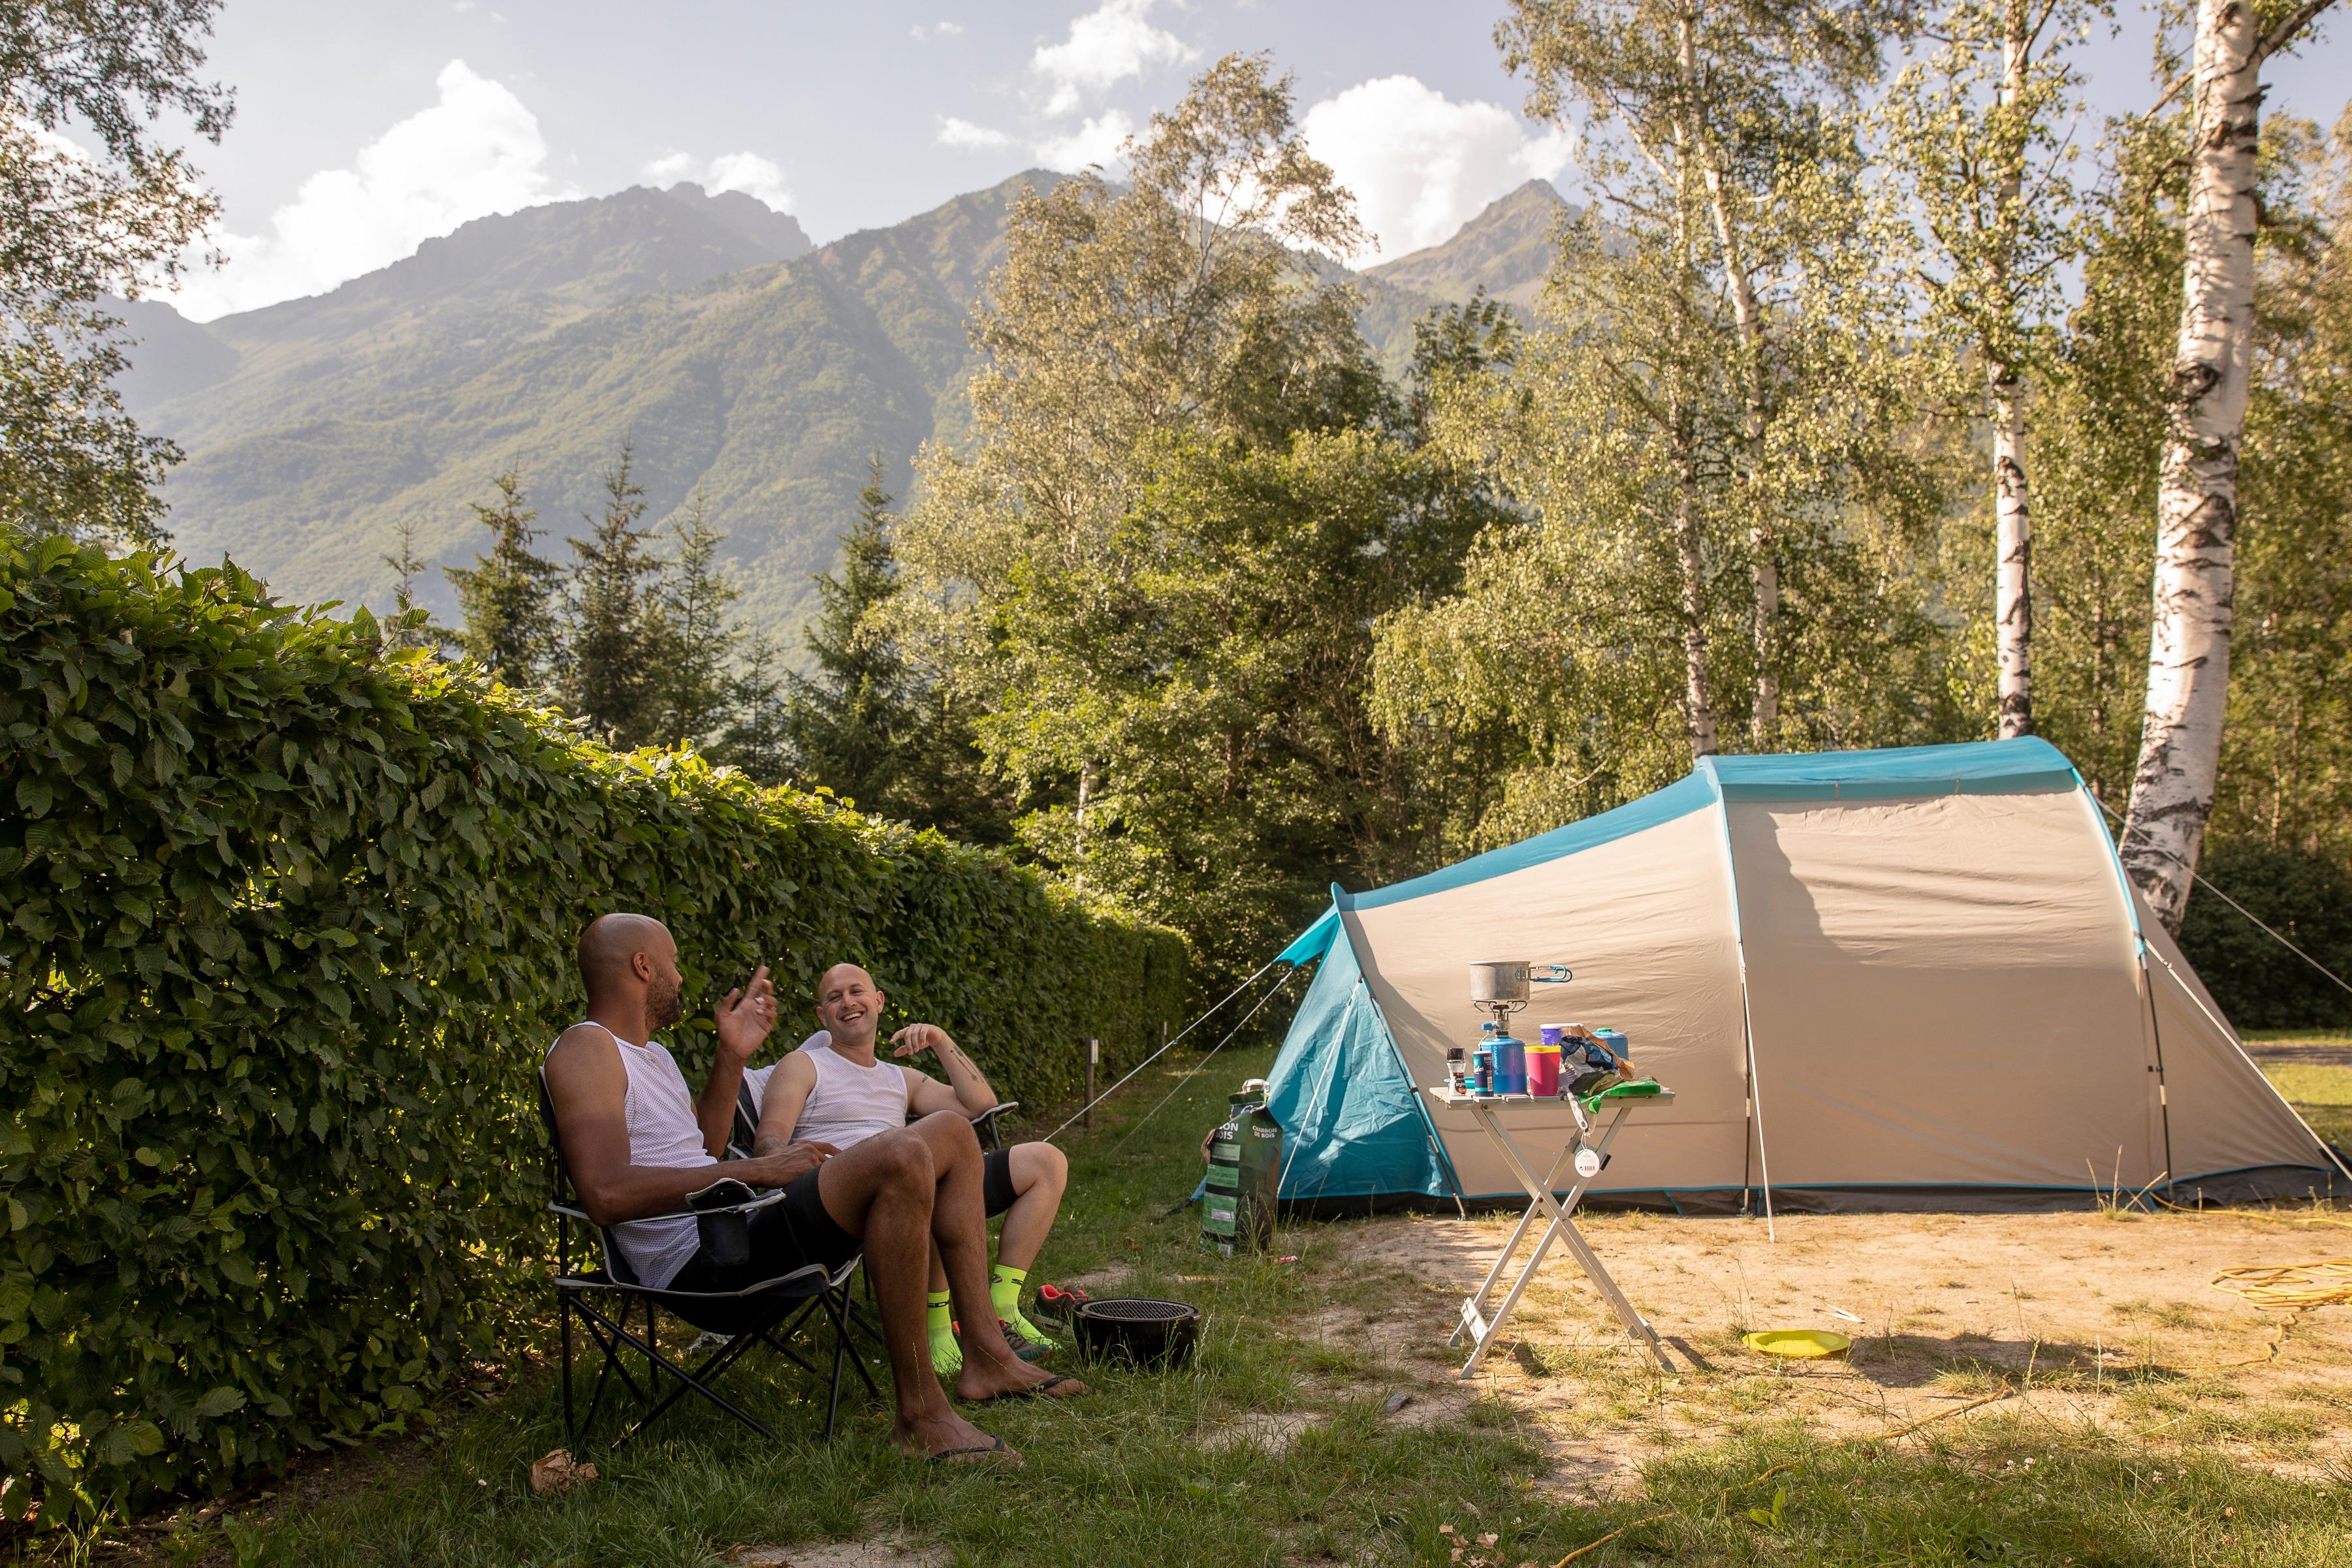 Tent met kampeerders - Belledonne